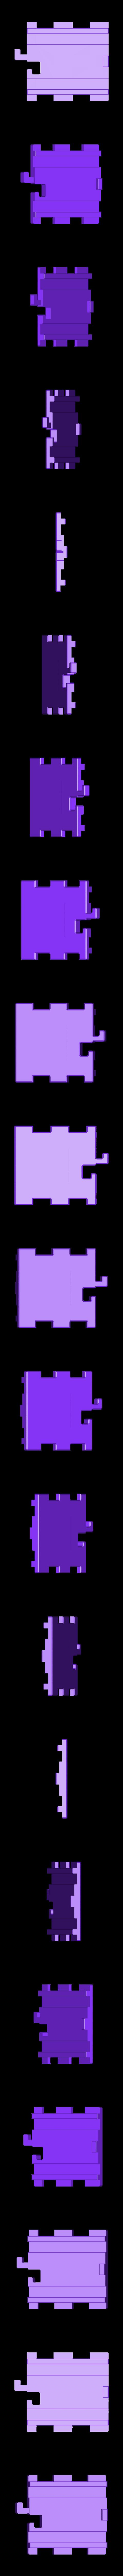 SmallToys-RailEndBumper.stl Download STL file SmallToys - Railways - Bumper stop • 3D printable model, Wabby